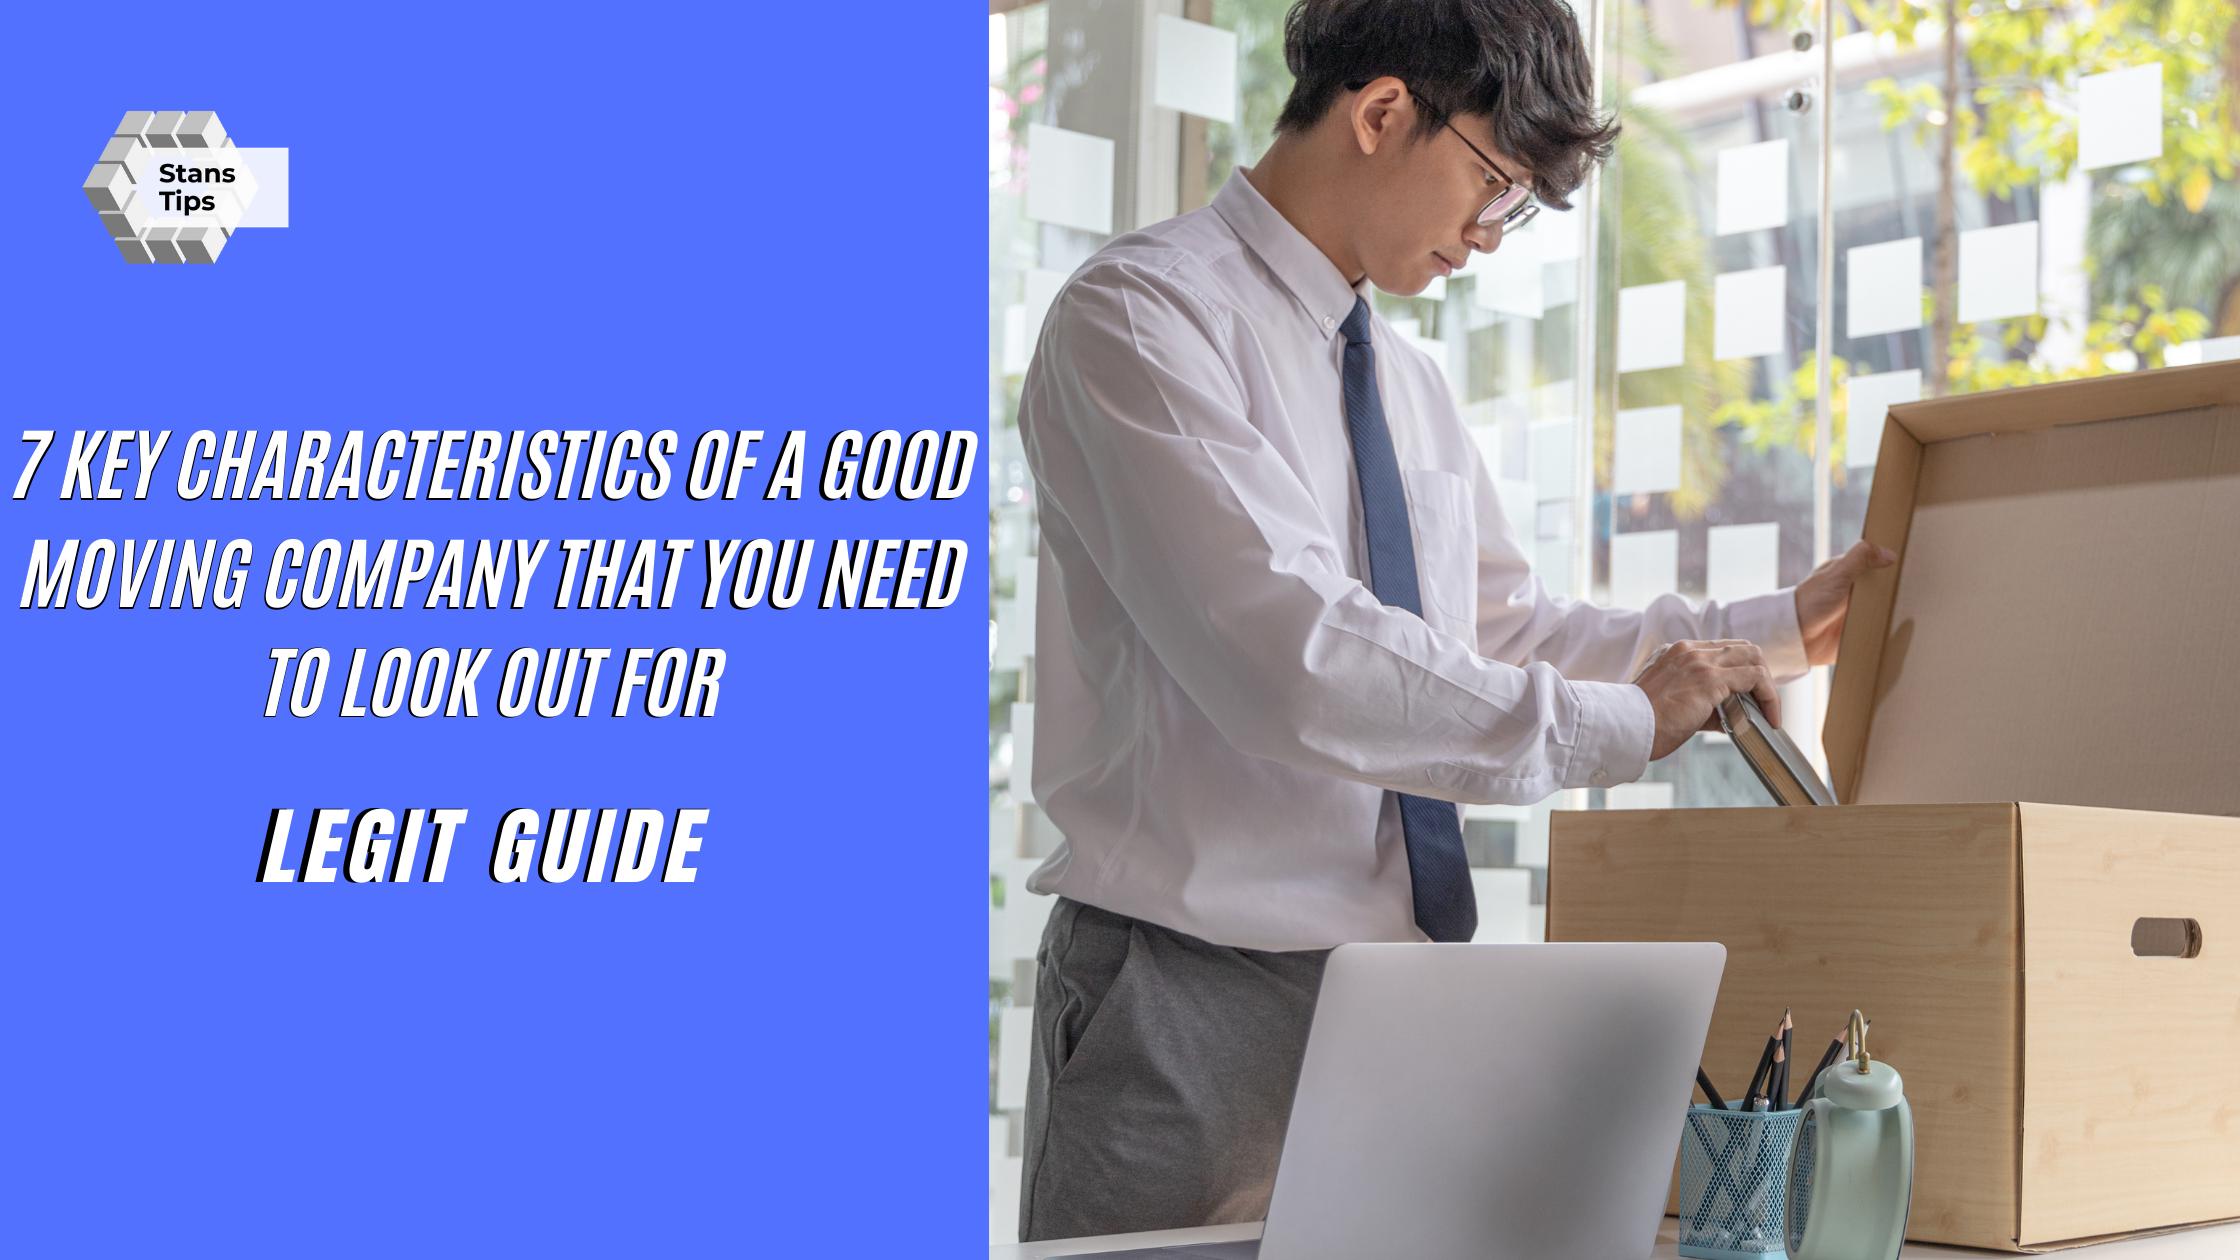 Key characteristics of a good moving company